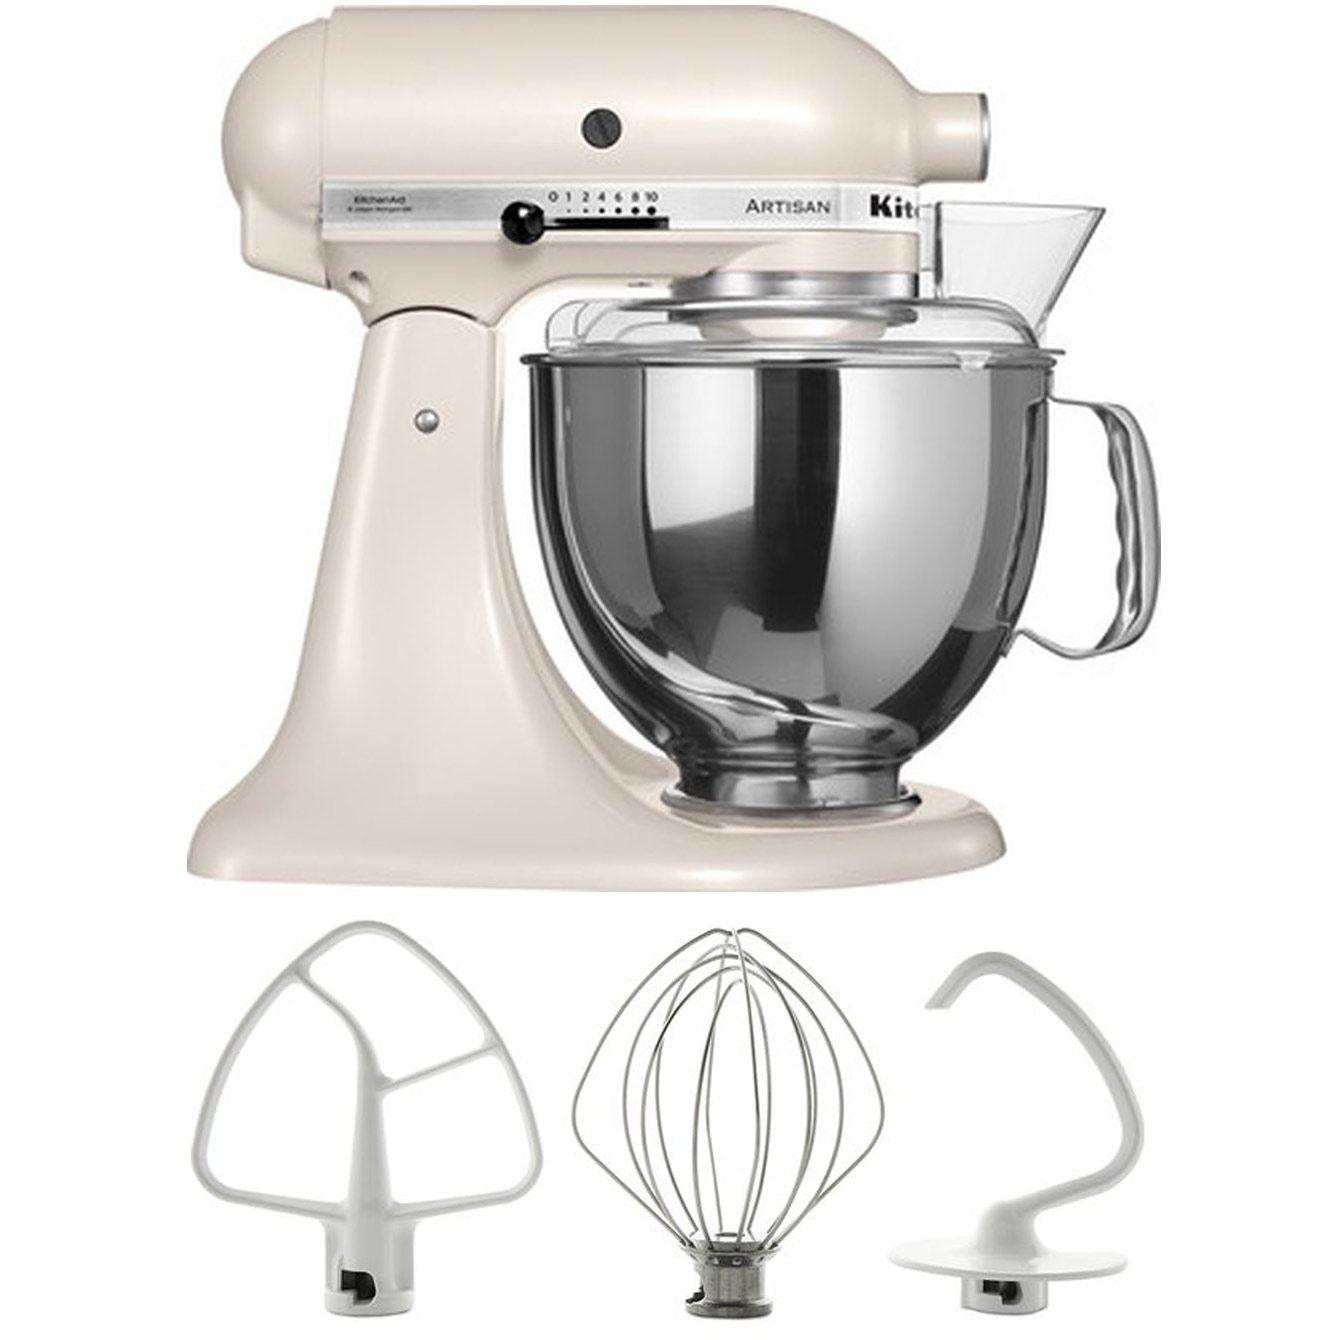 Kitchenaid artisan stand mixer giveaway kitchen aid